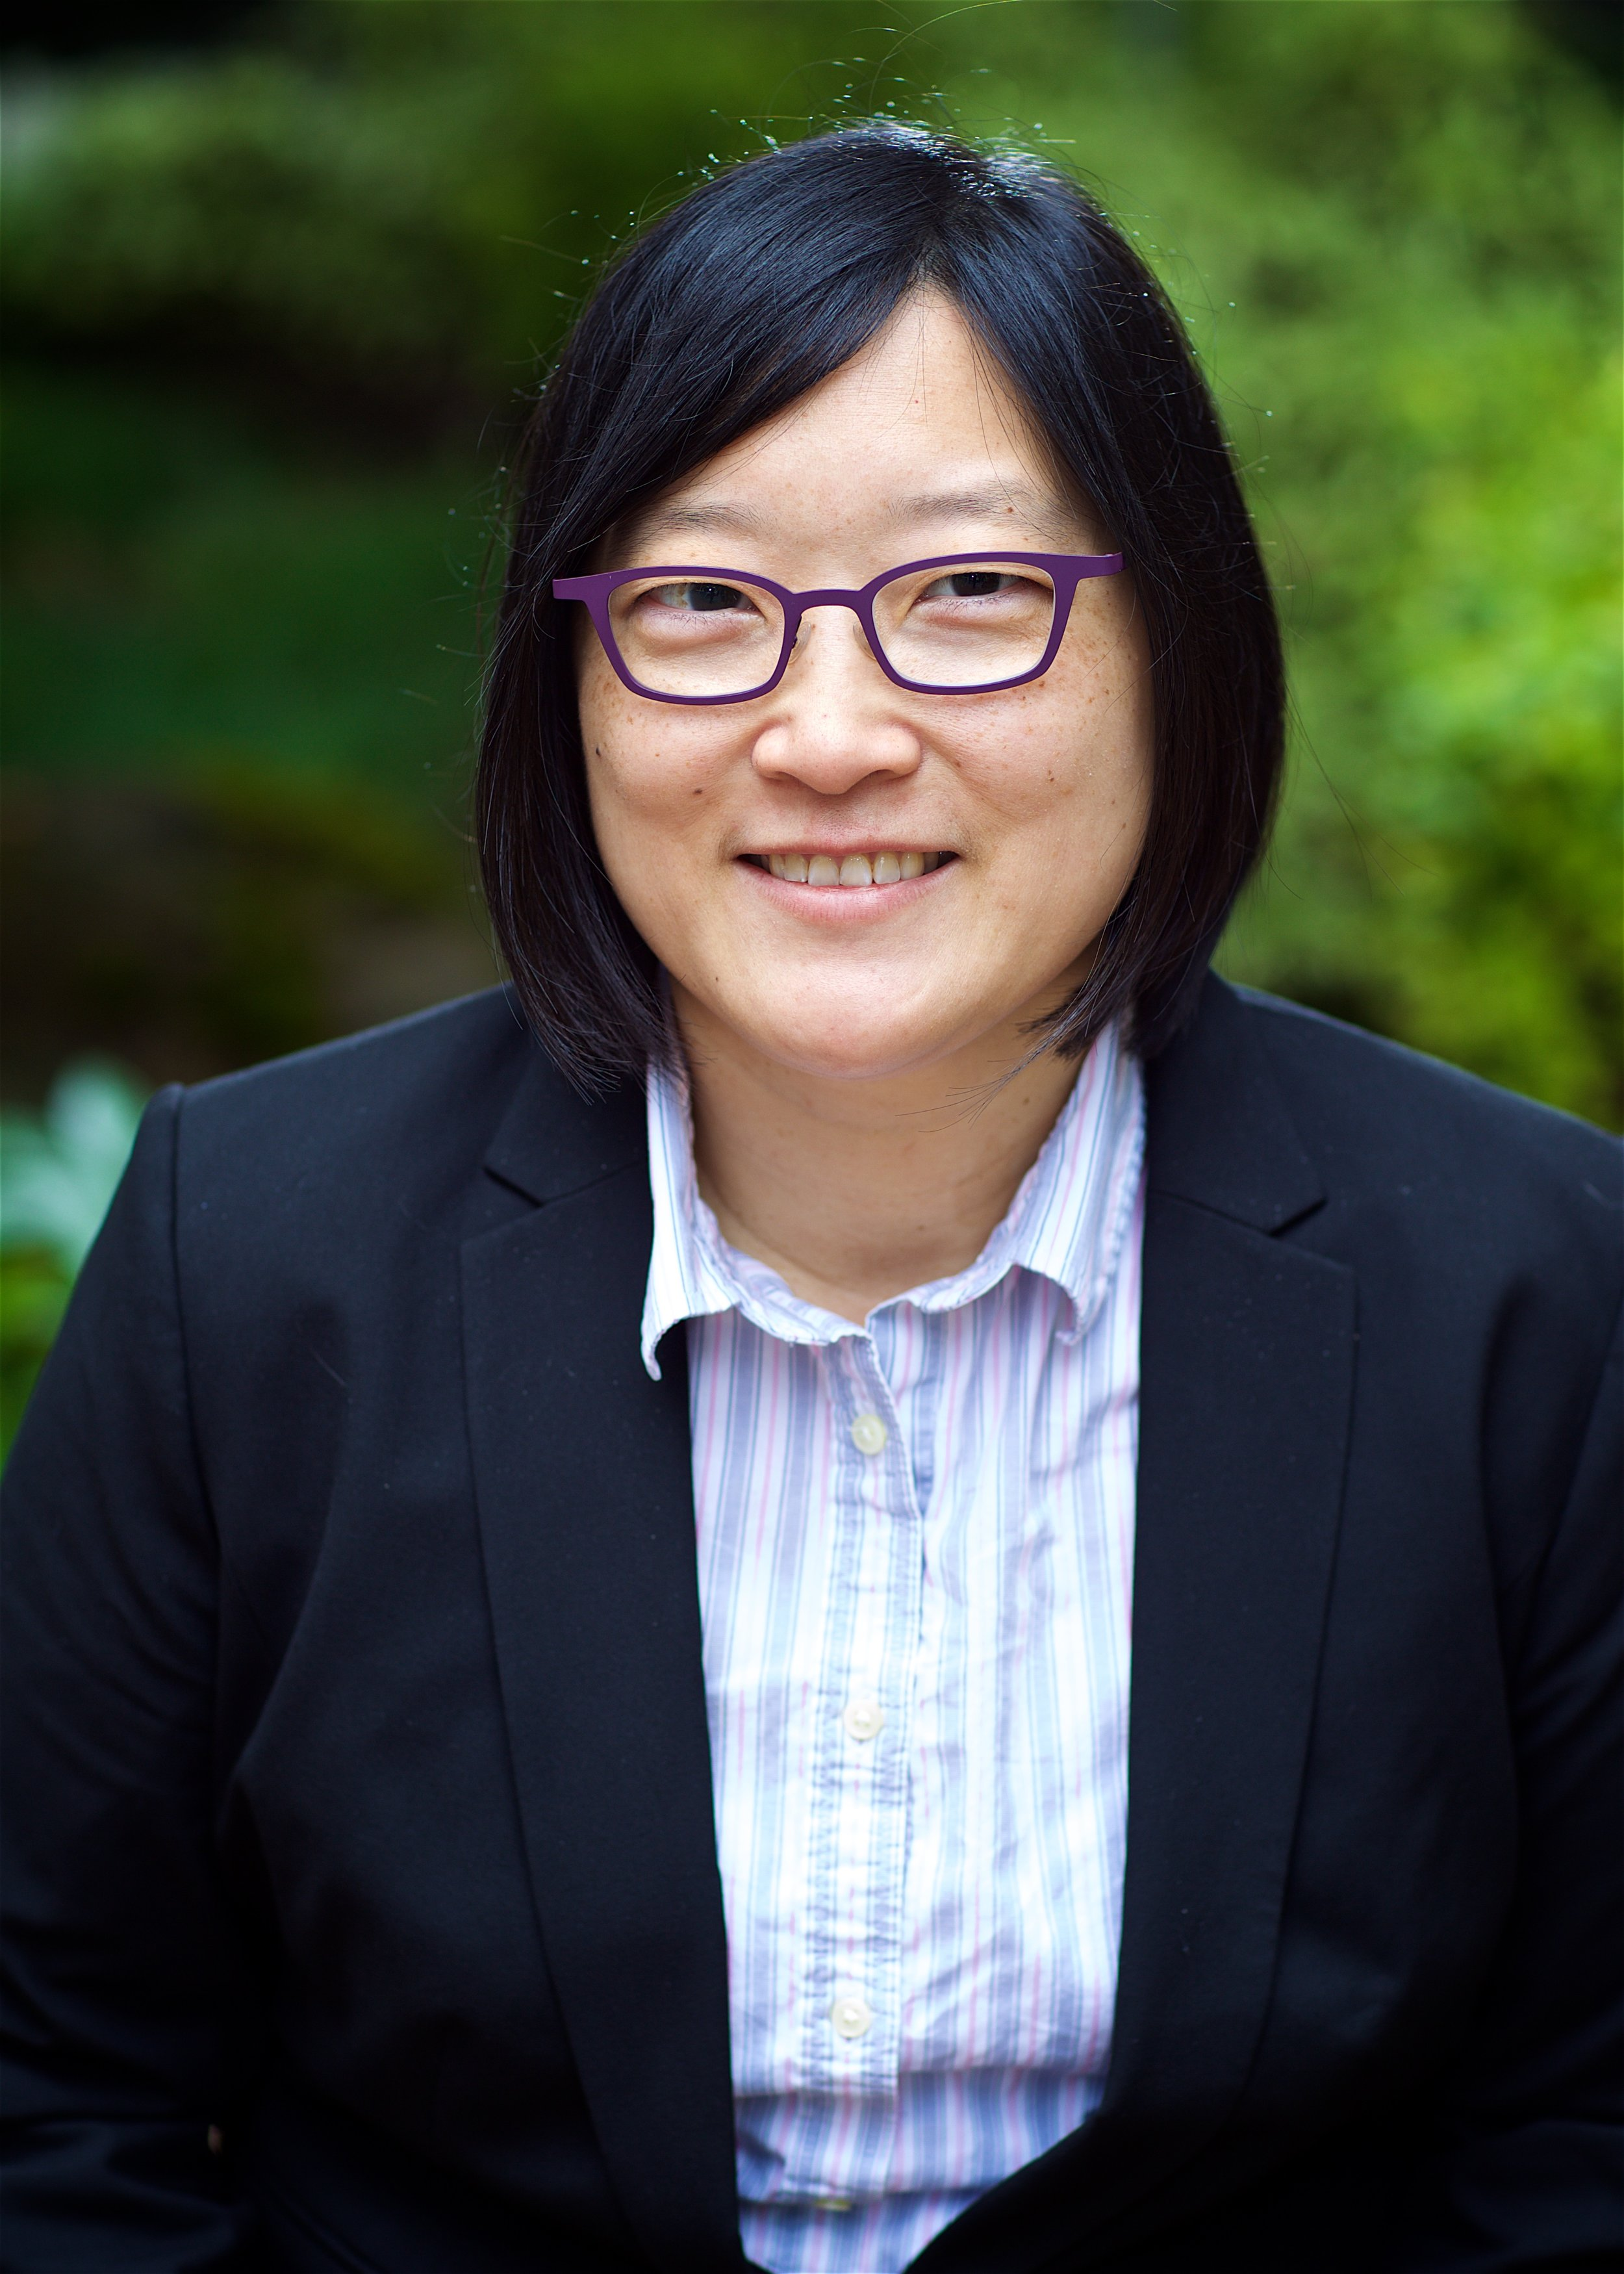 Anna Kim   Puget Sound Discovery, Class of 2018